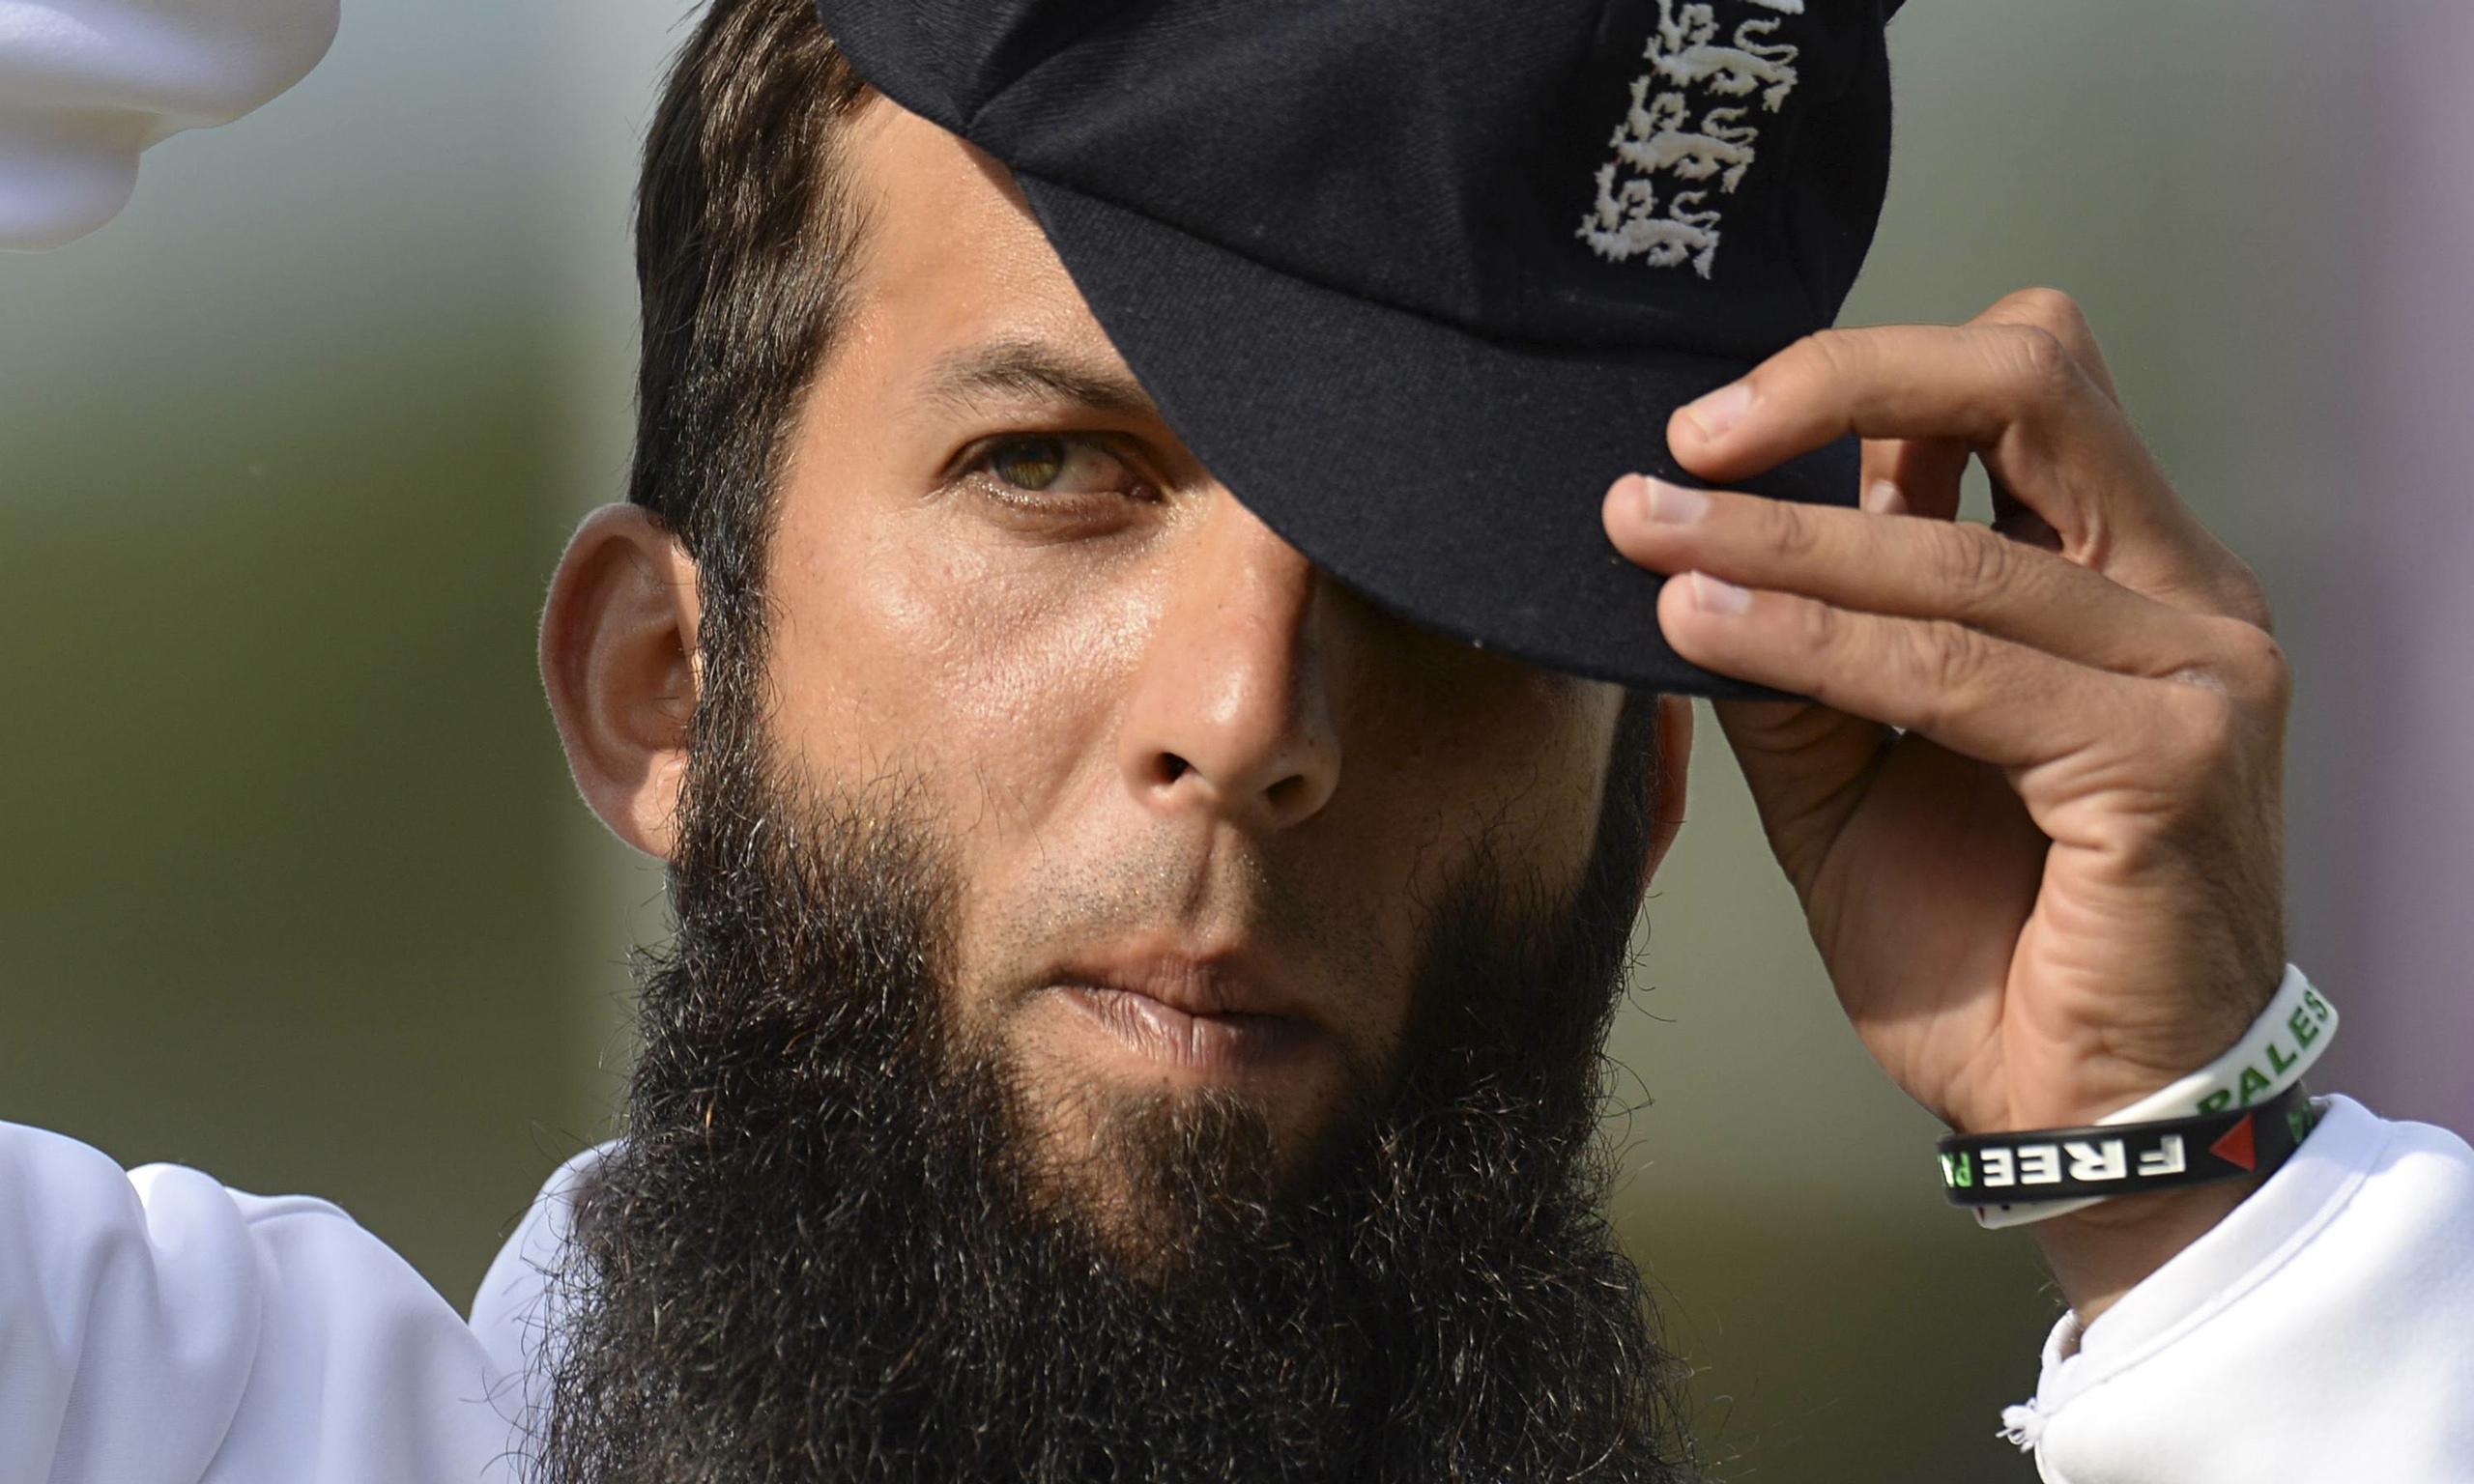 England's Ali